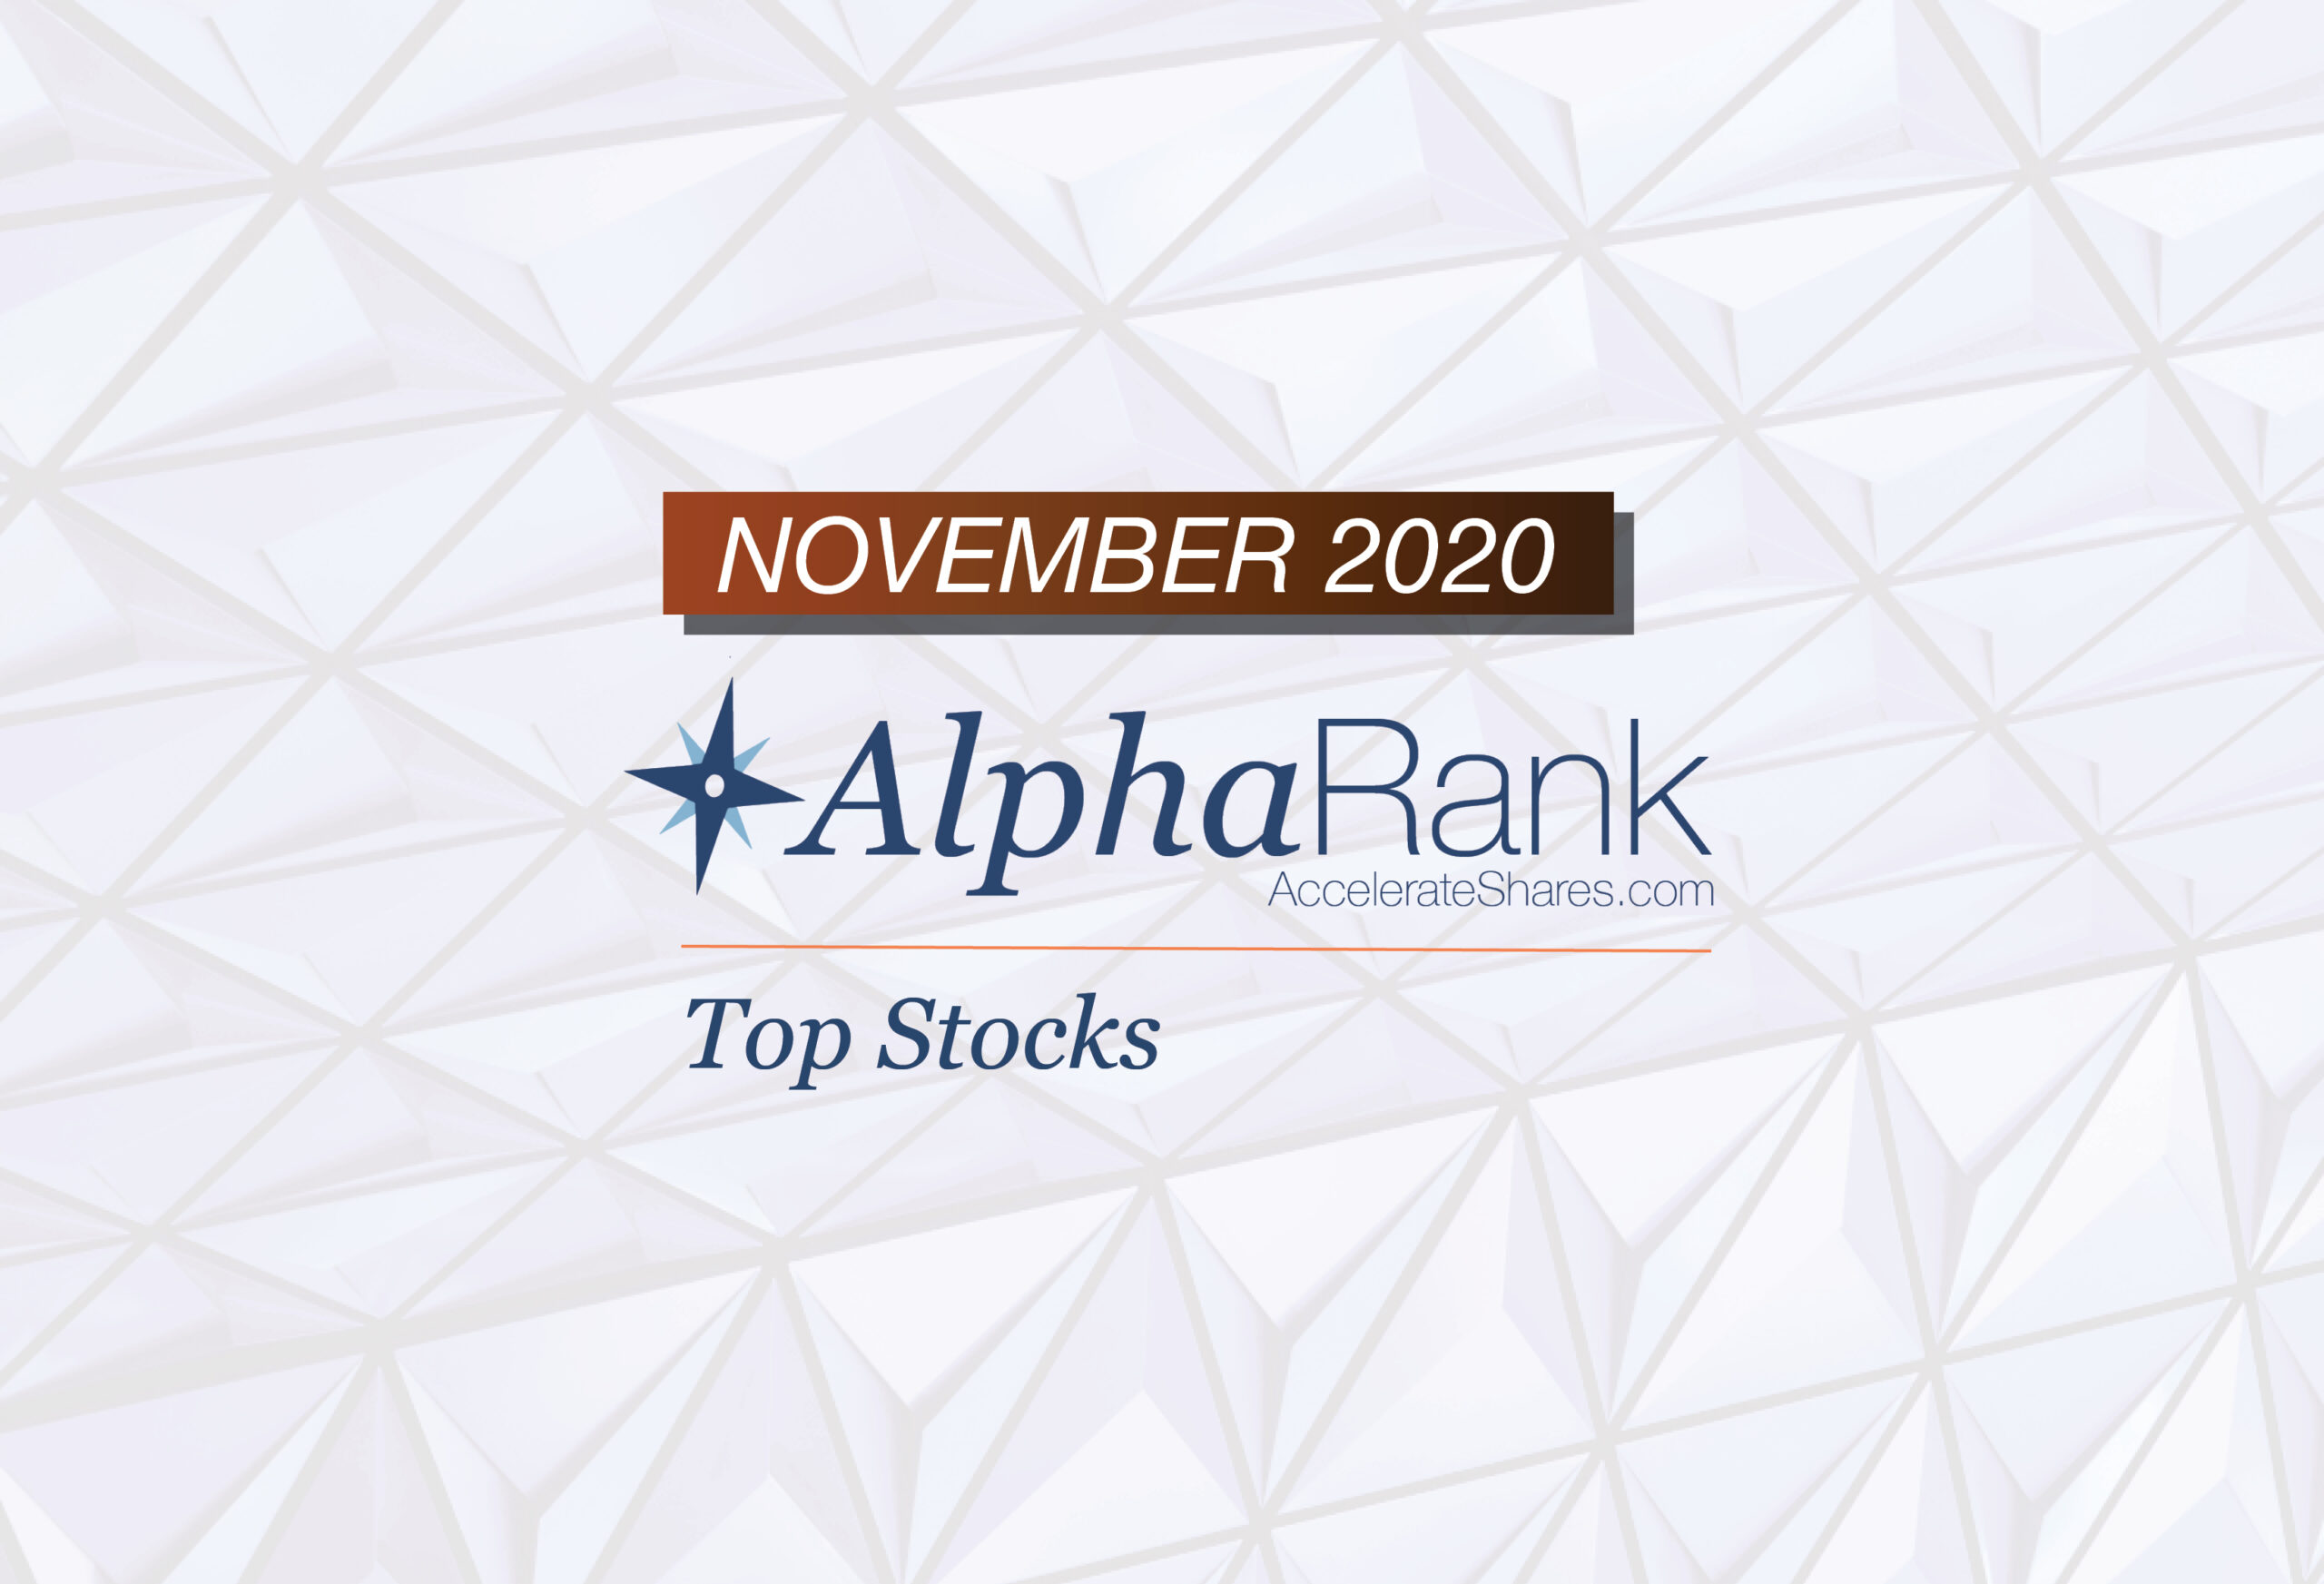 AlphaRank Top Stocks- November 2020